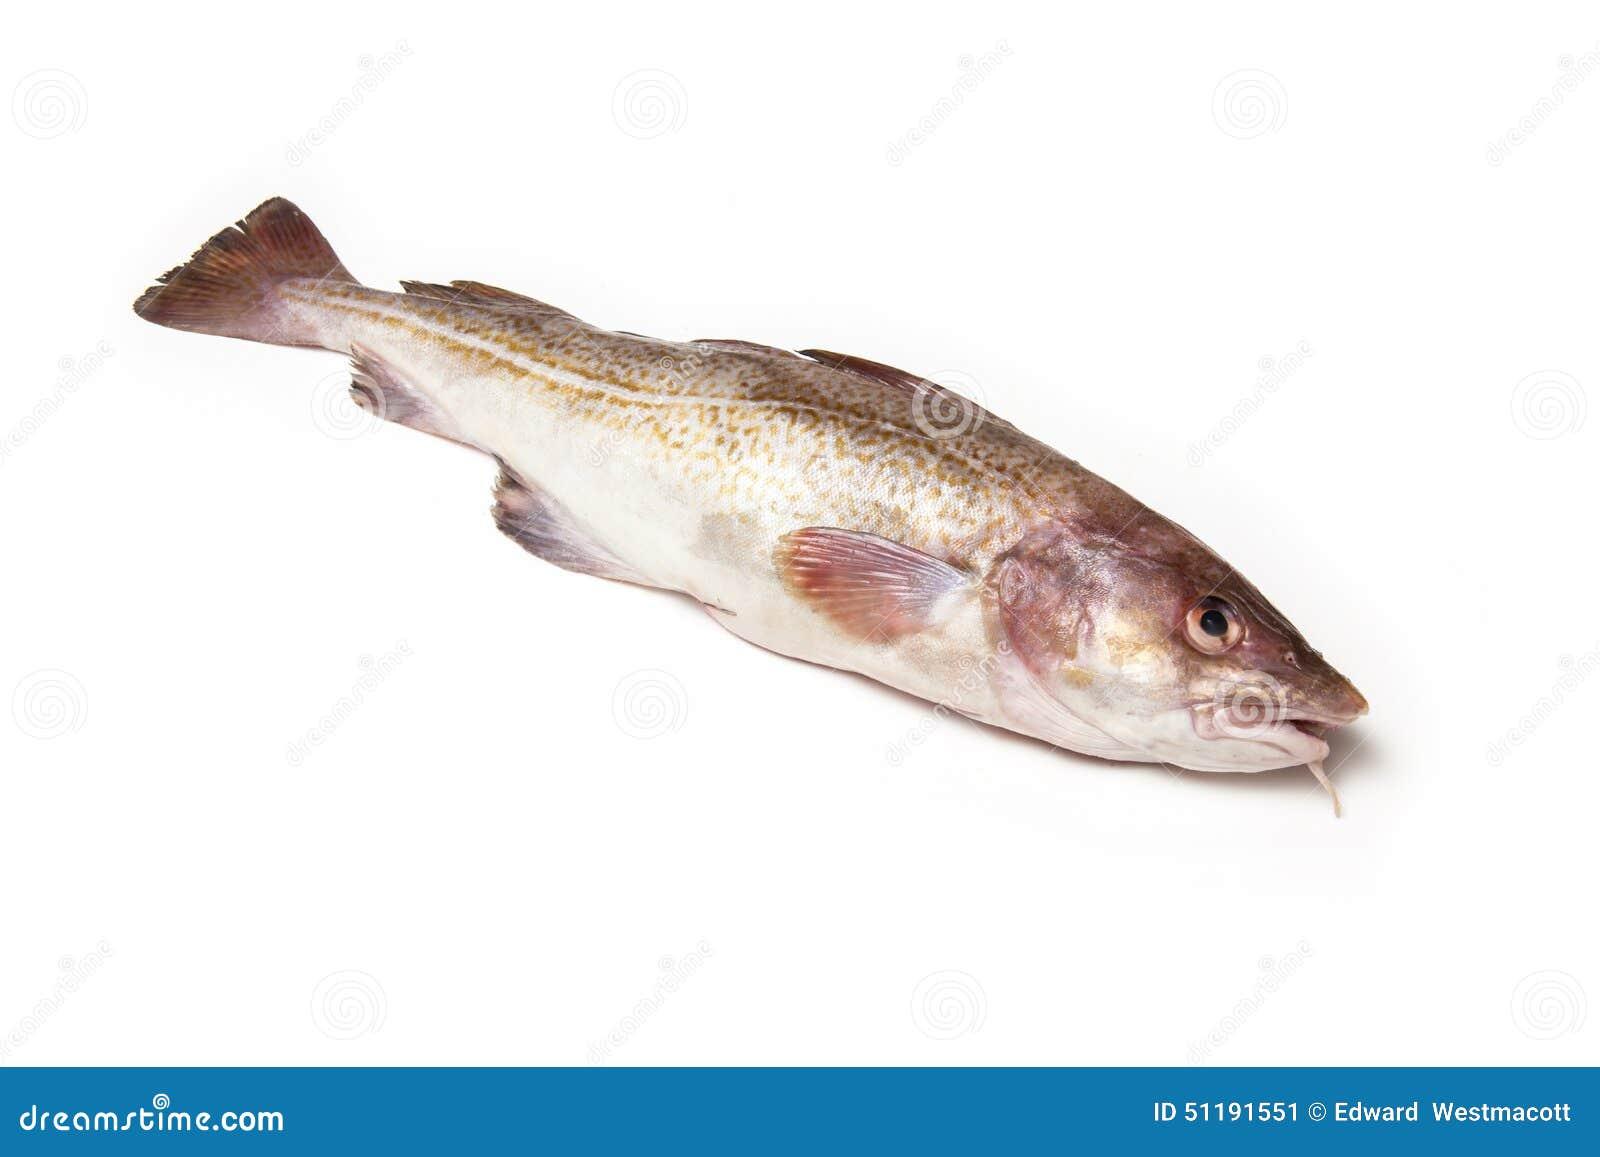 Whole cod fish stock photo image 51191551 for Atlantic cod fish